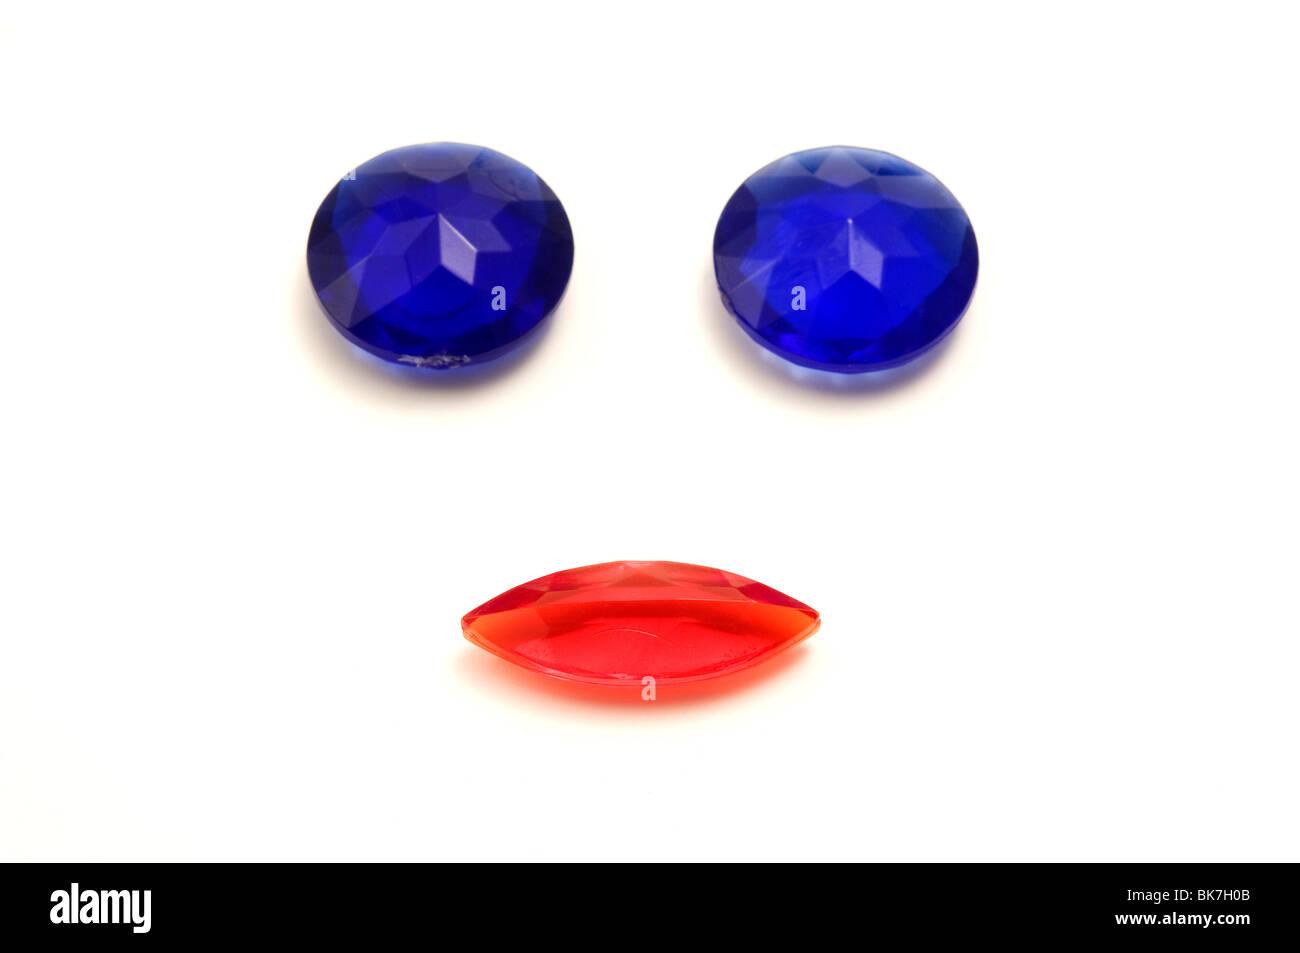 Plastic gemstones on a white background - Stock Image